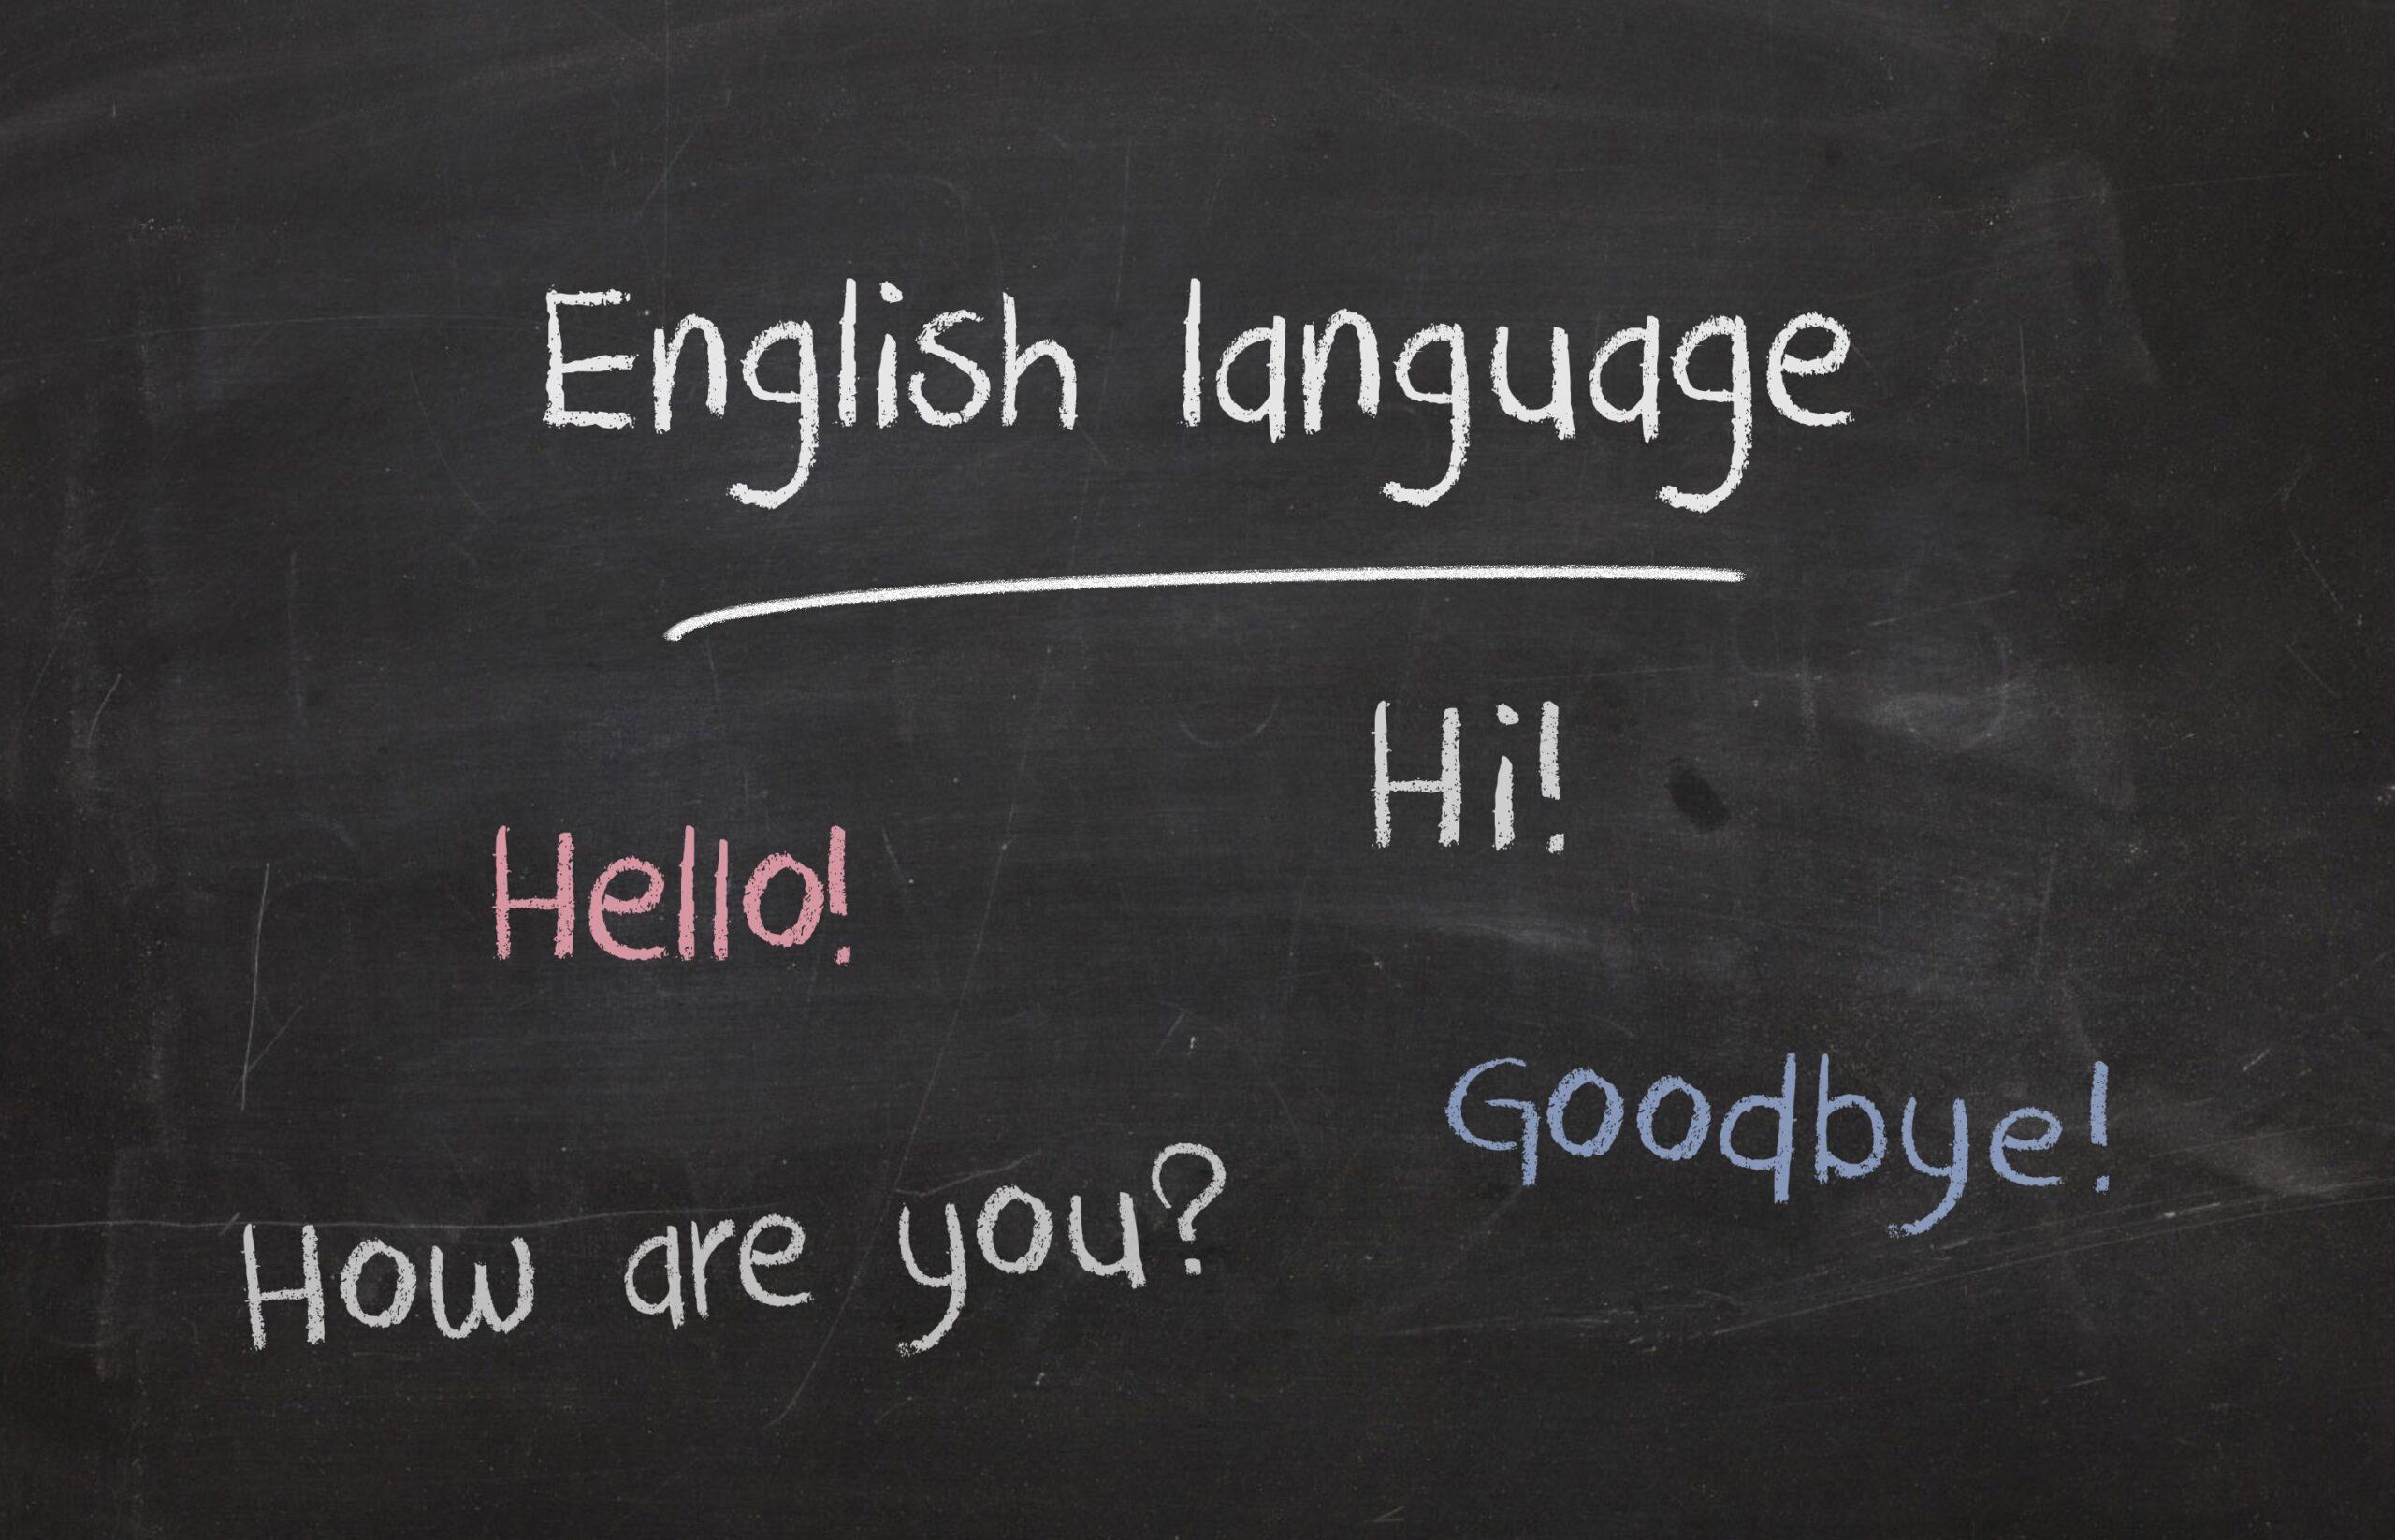 C言語の文法を右脳でサクッと理解